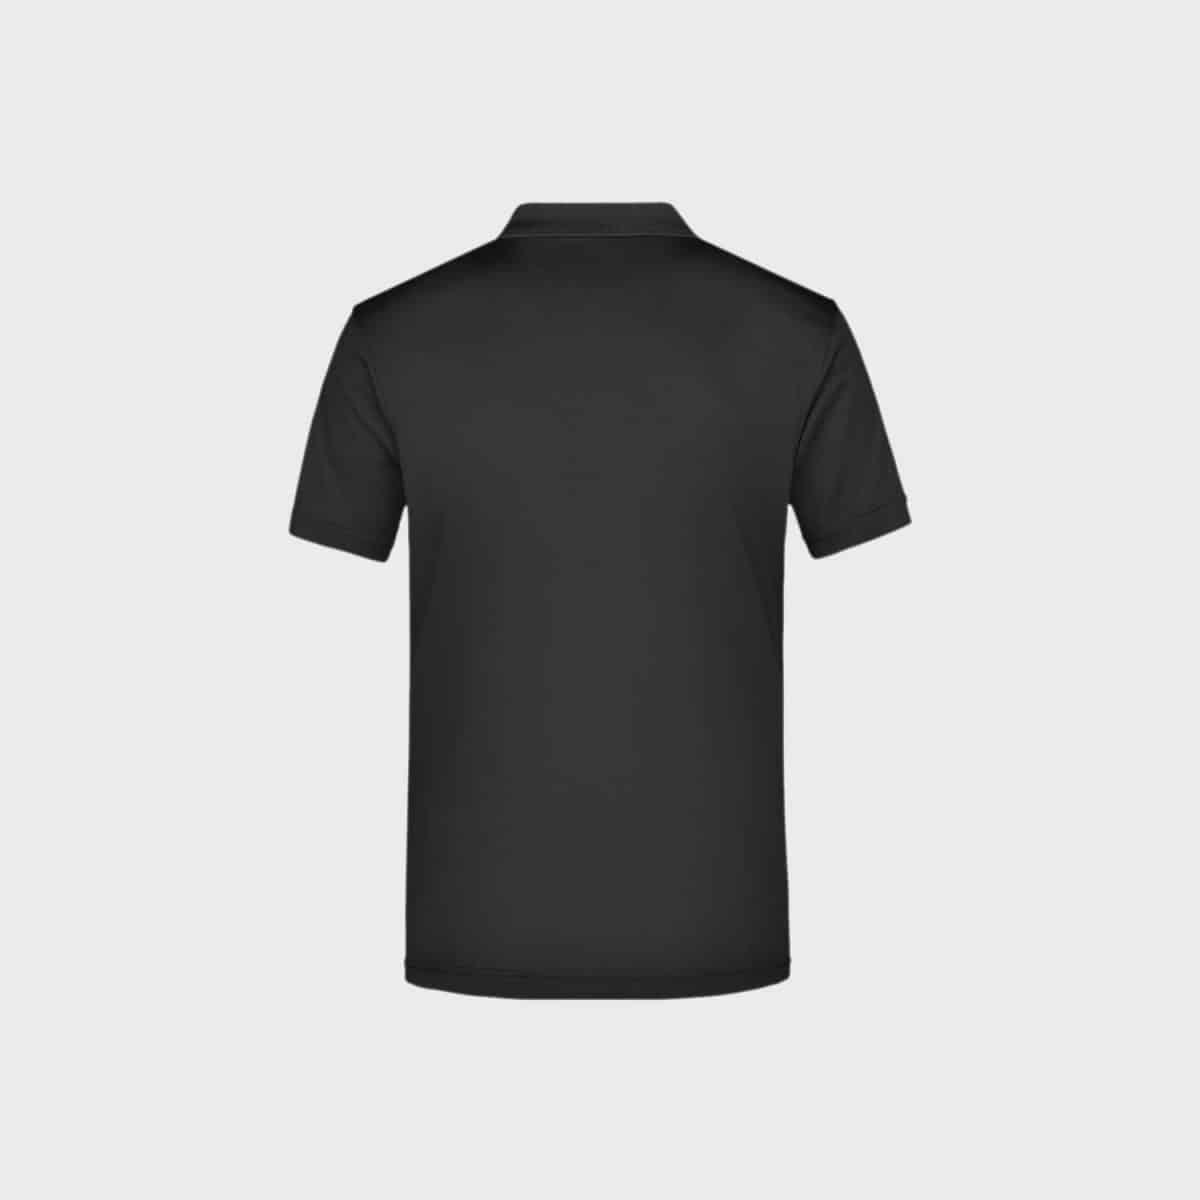 Daiber SportShirts JN401 Black Back